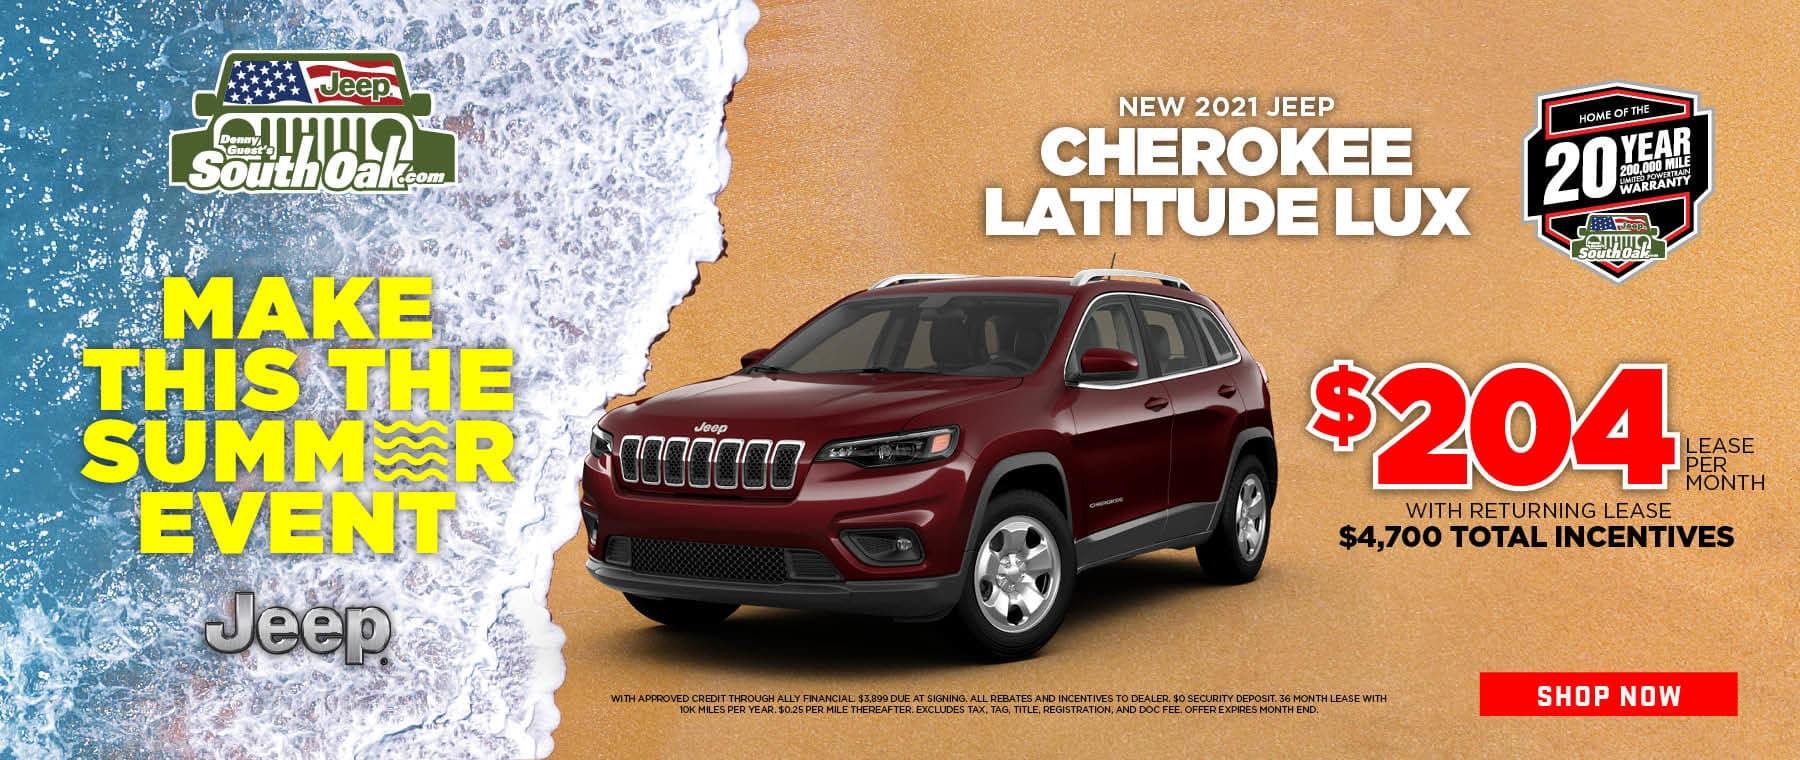 2021 Jeep Cherokee Special